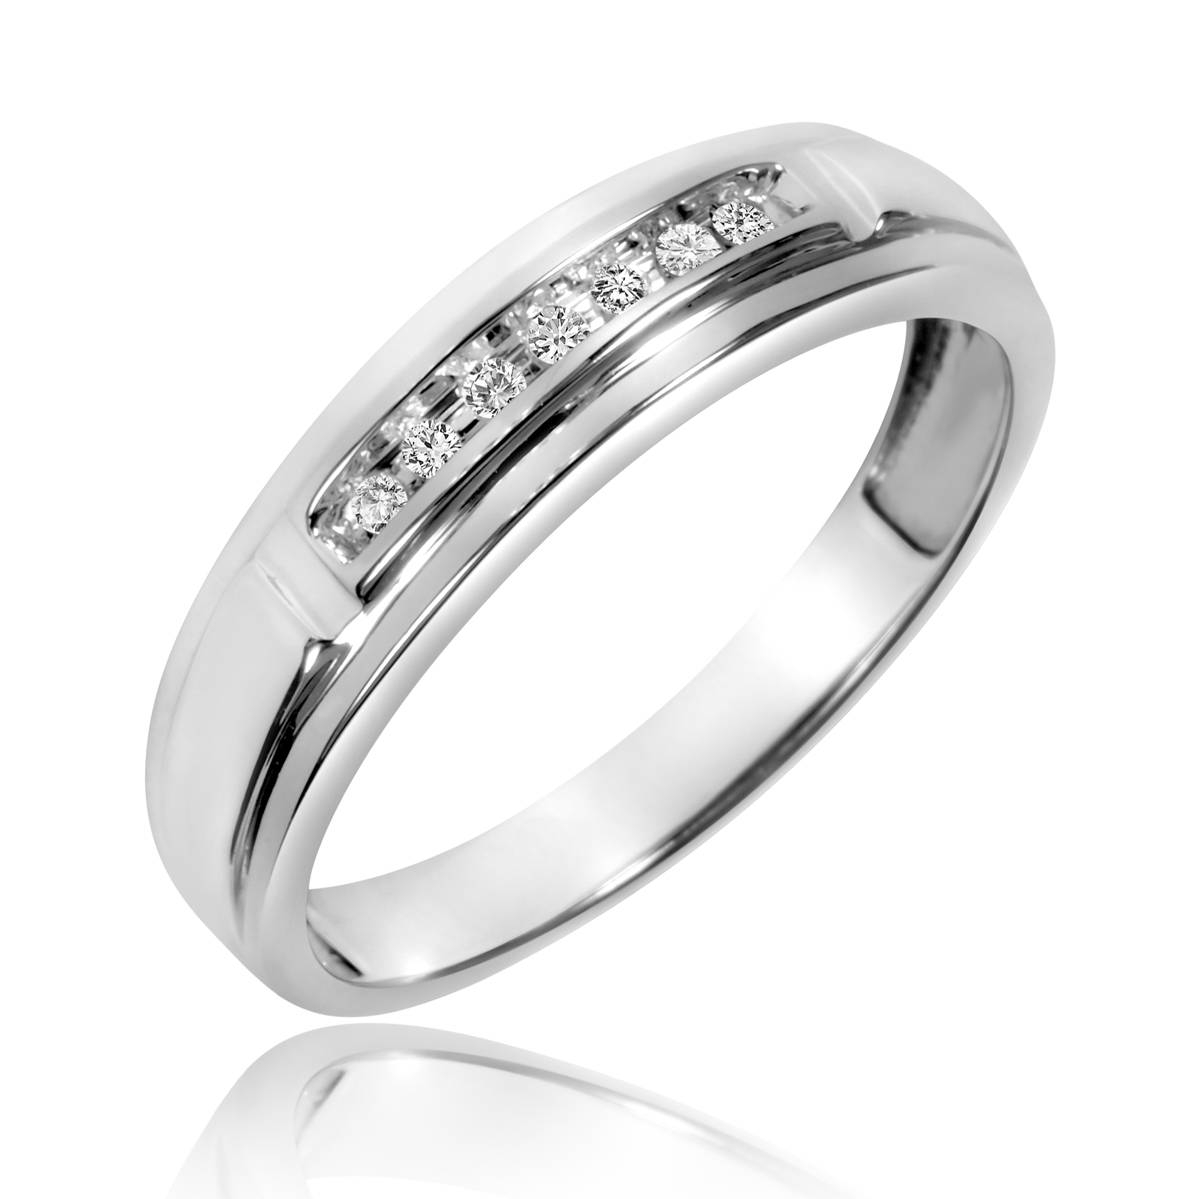 1/15 Carat T.w. Diamond Men's Wedding Band 10K White Gold Throughout Mens White Gold Wedding Bands With Diamonds (Gallery 2 of 15)